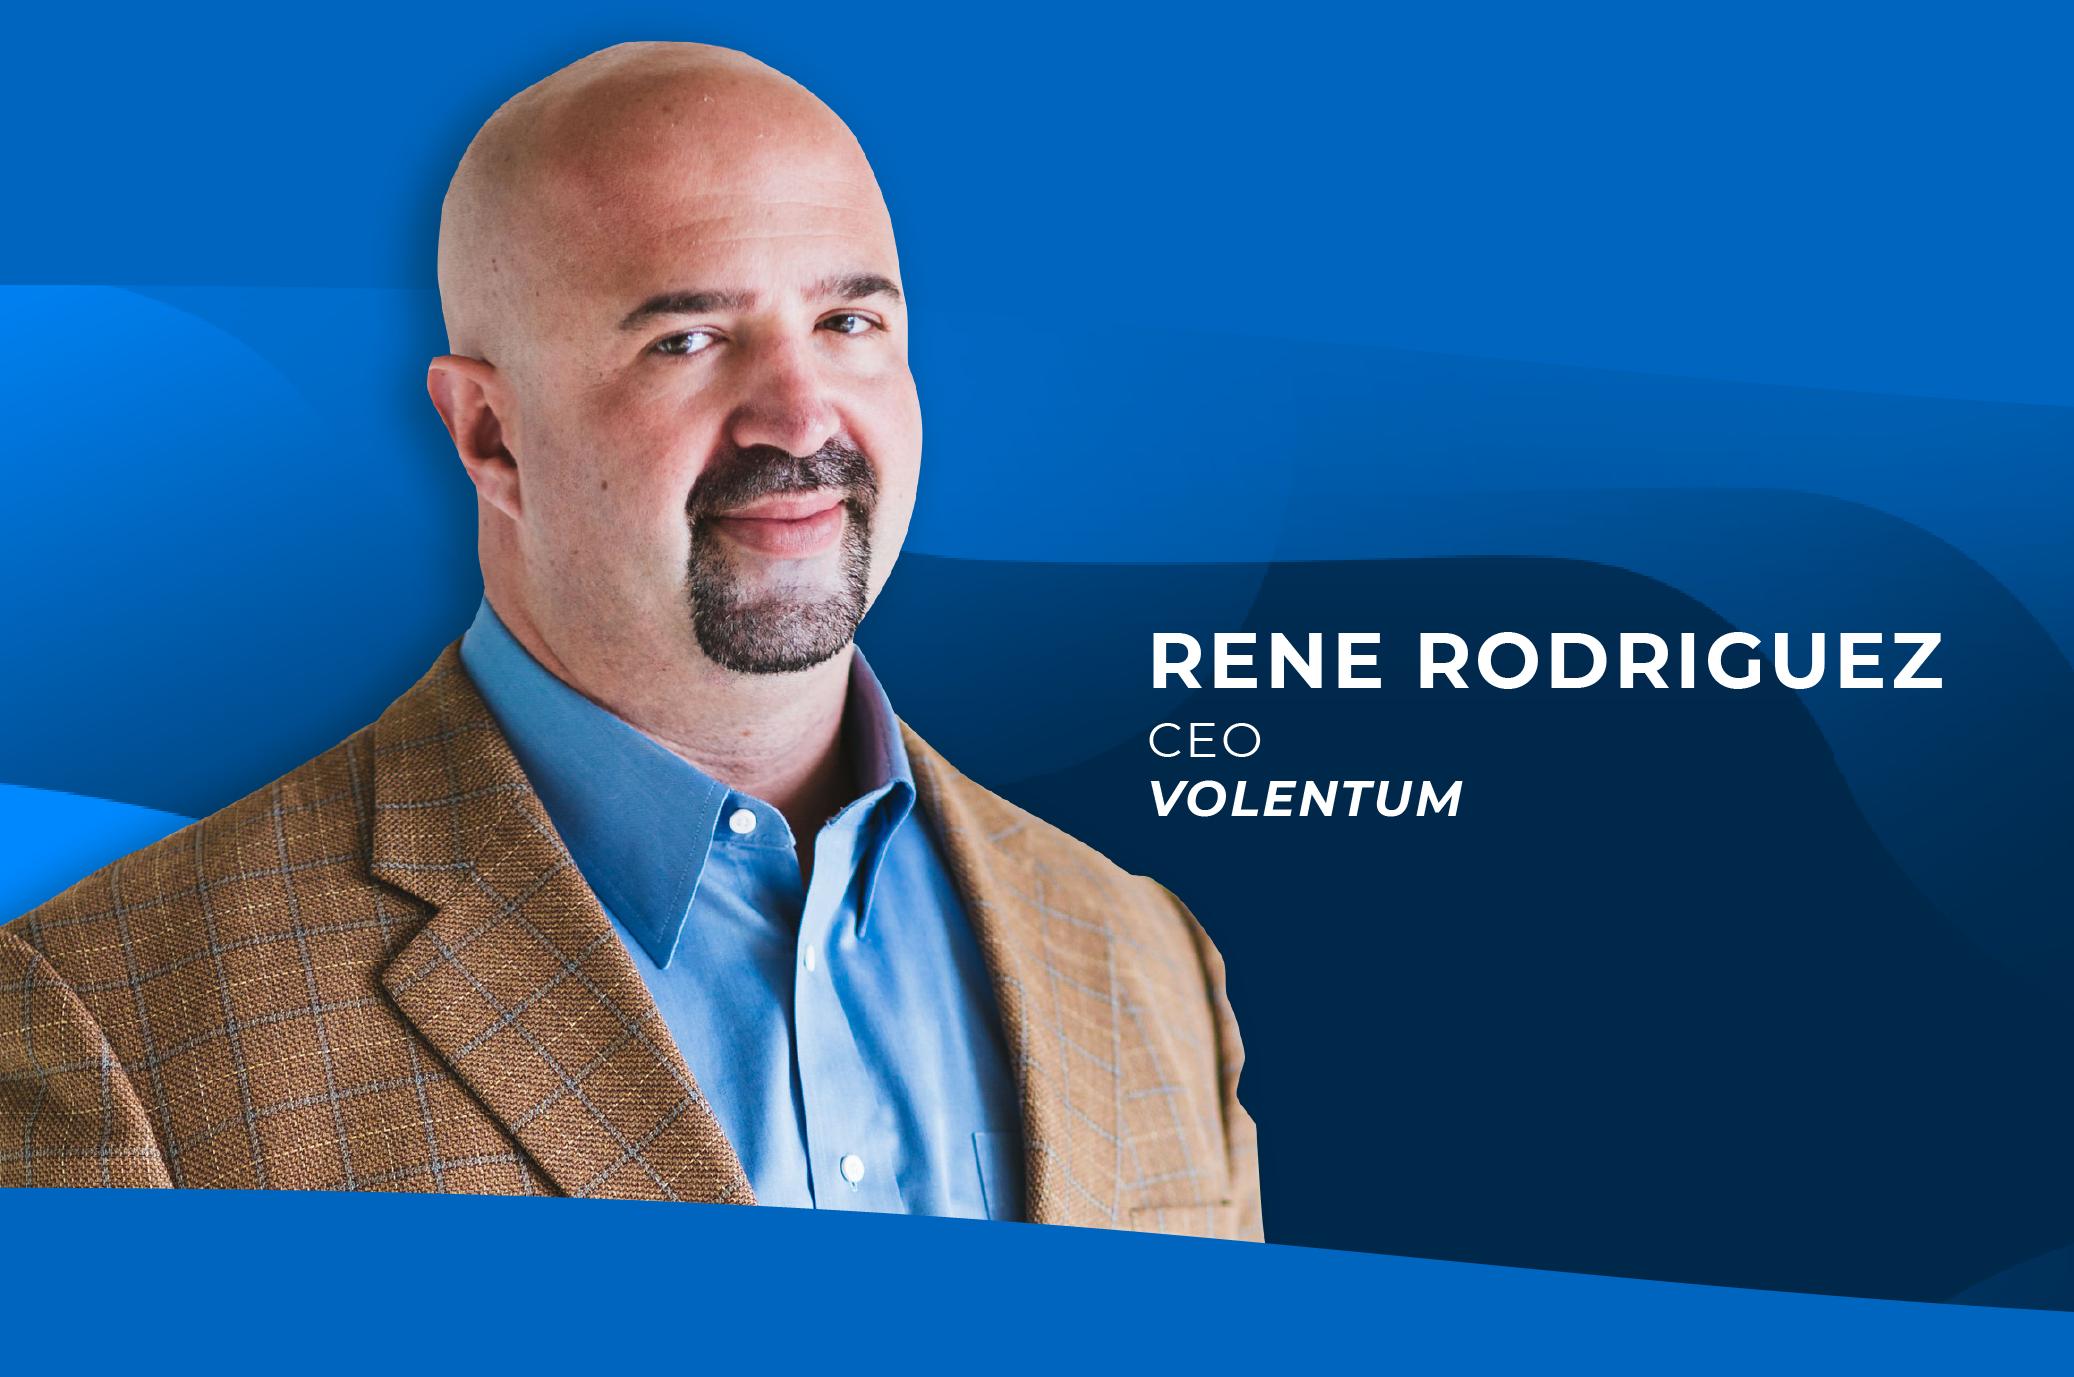 Rene Rodriguez, CEO of Volentum